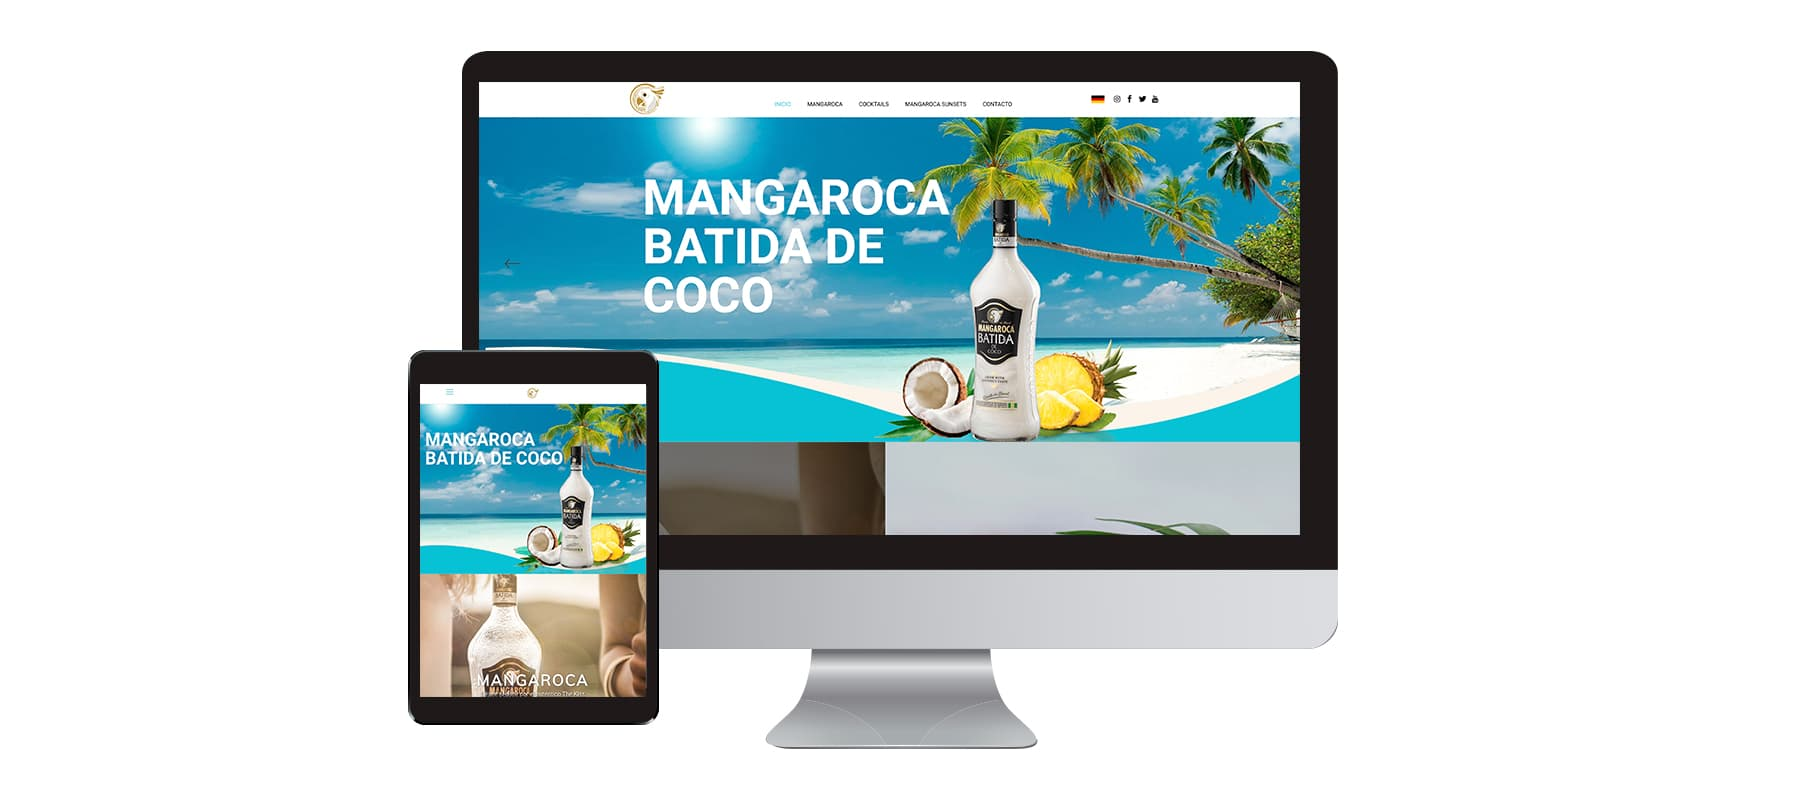 Mangaroca (1)